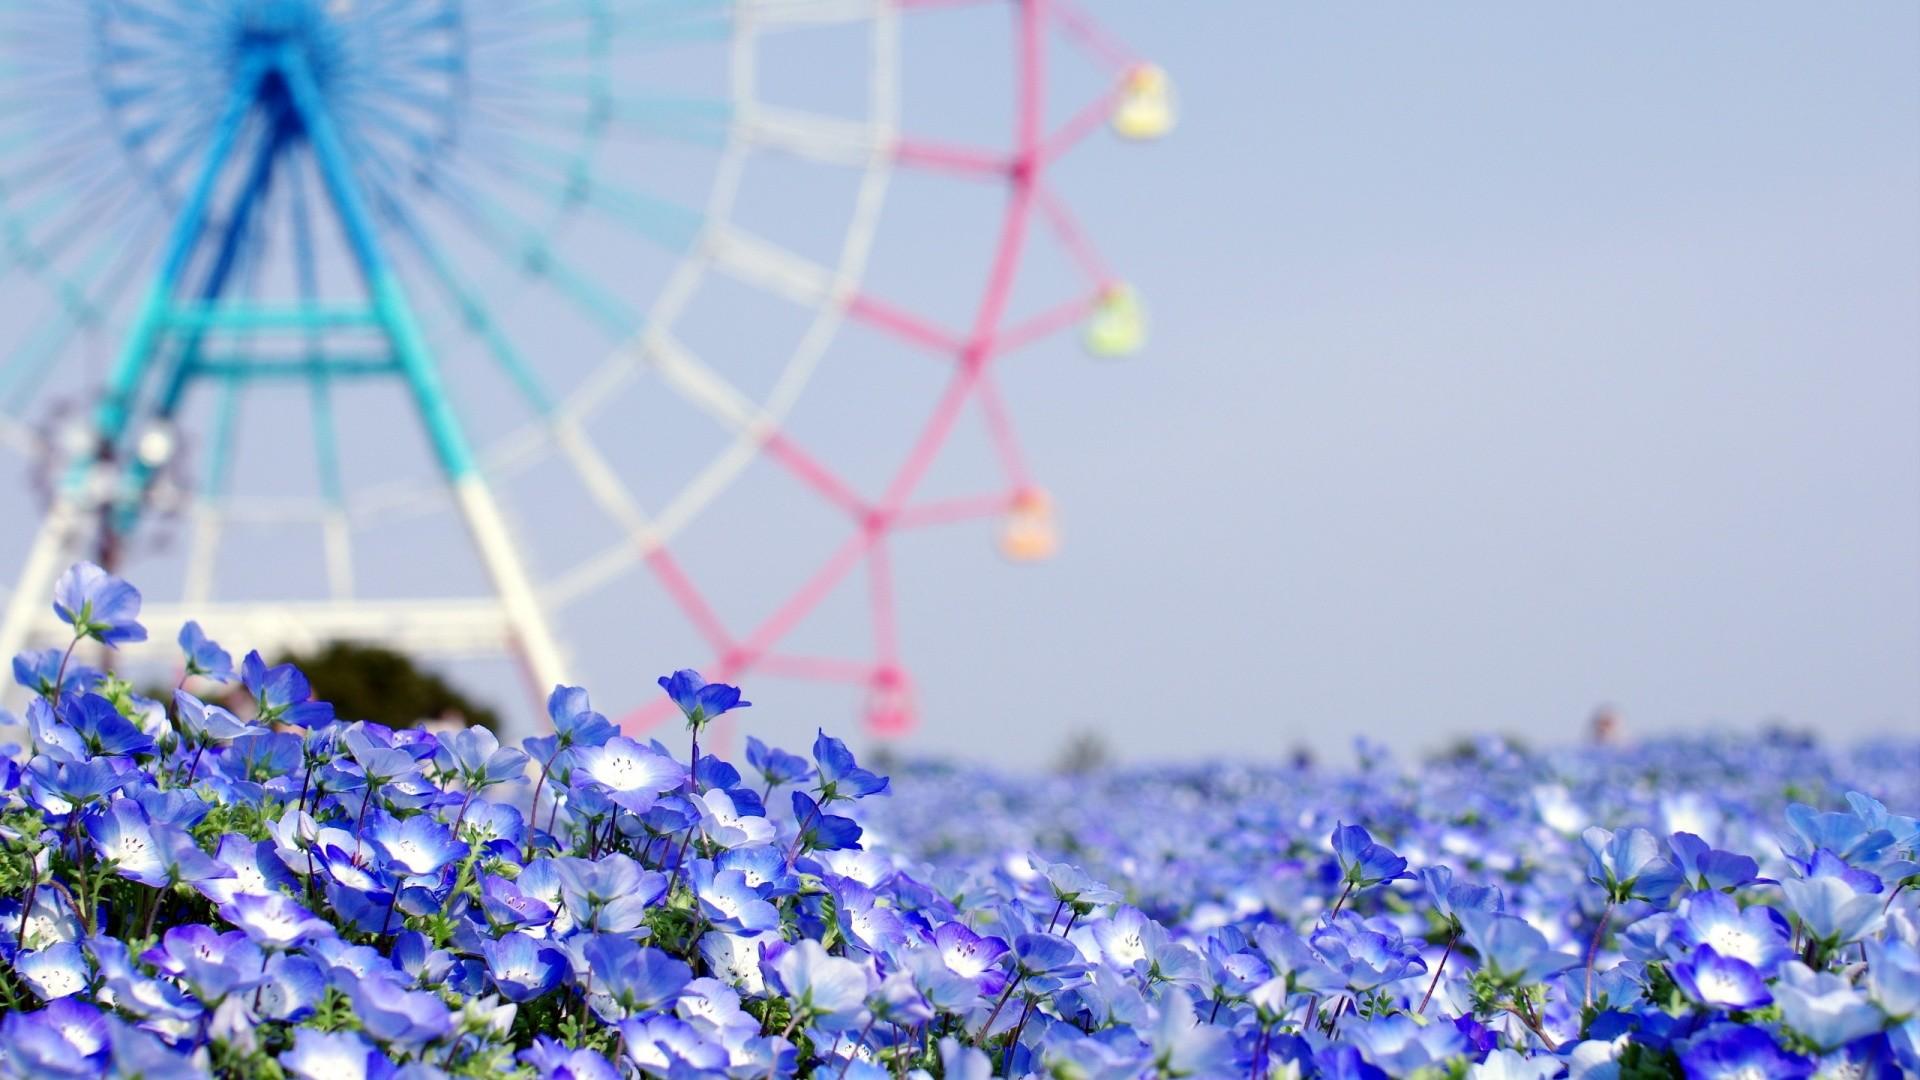 Res: 1920x1080, Summer Flowers Wallpaper 29988